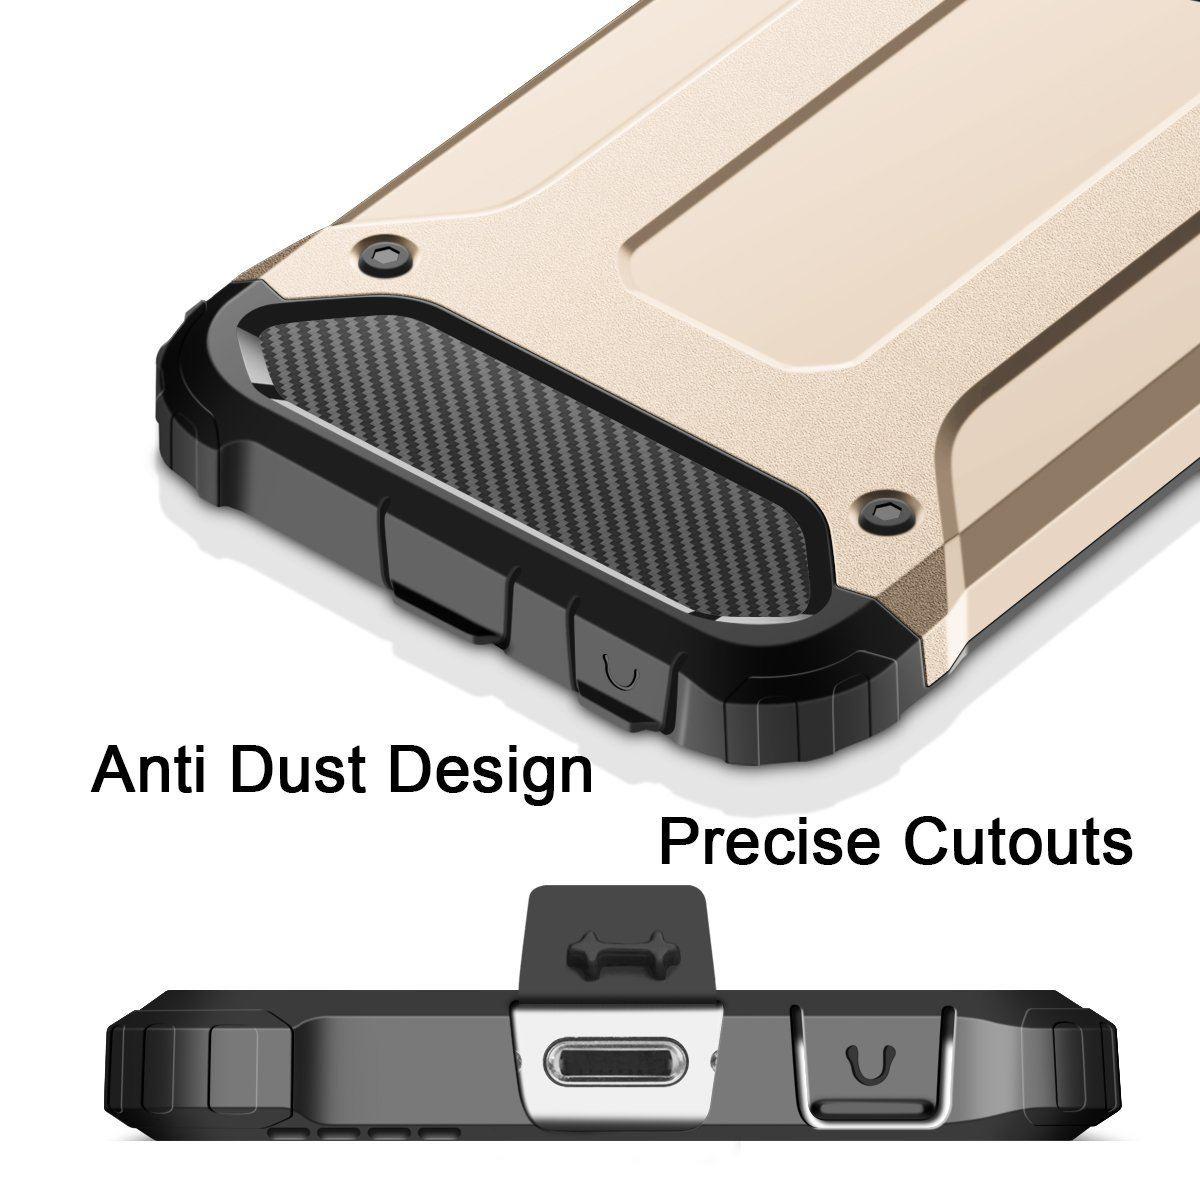 thumbnail 78 - For Apple iPhone 11 Pro Max XR Xs X 8 7 Plus 6 5 Se Case Cover Tough Armor